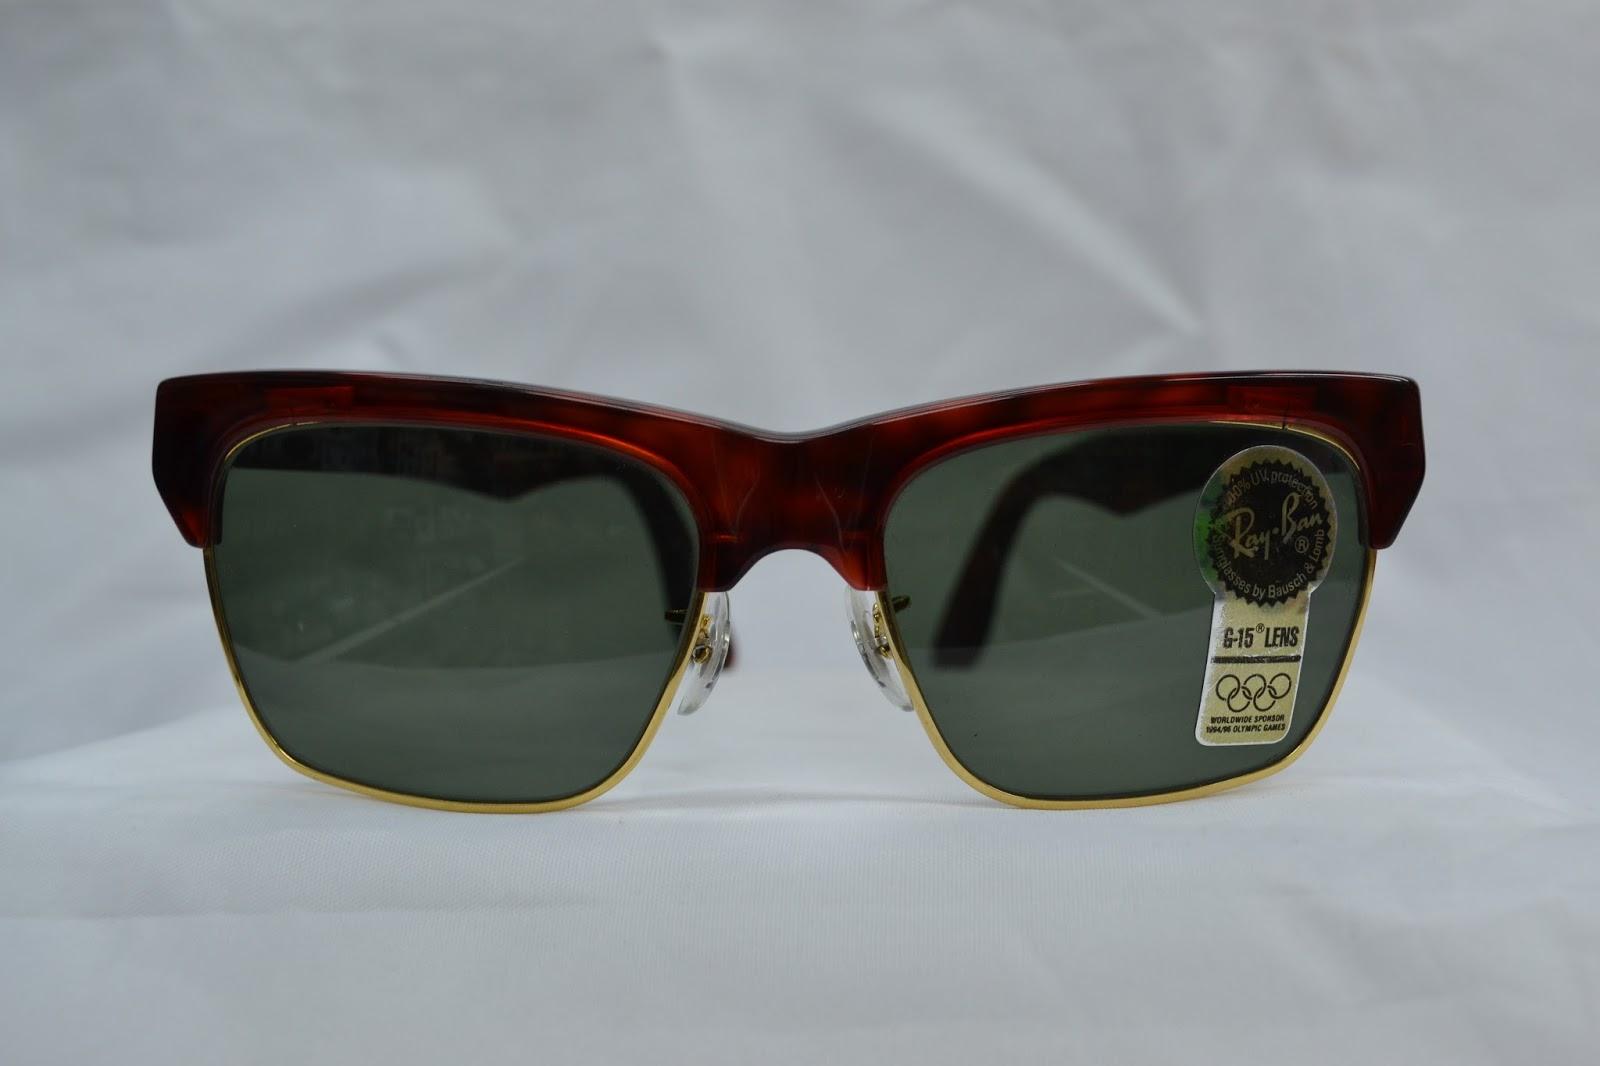 fb7f4e183d Vintage sunglass  Vintage Ray Ban Wayfarer Max W0923! NOS! USA!